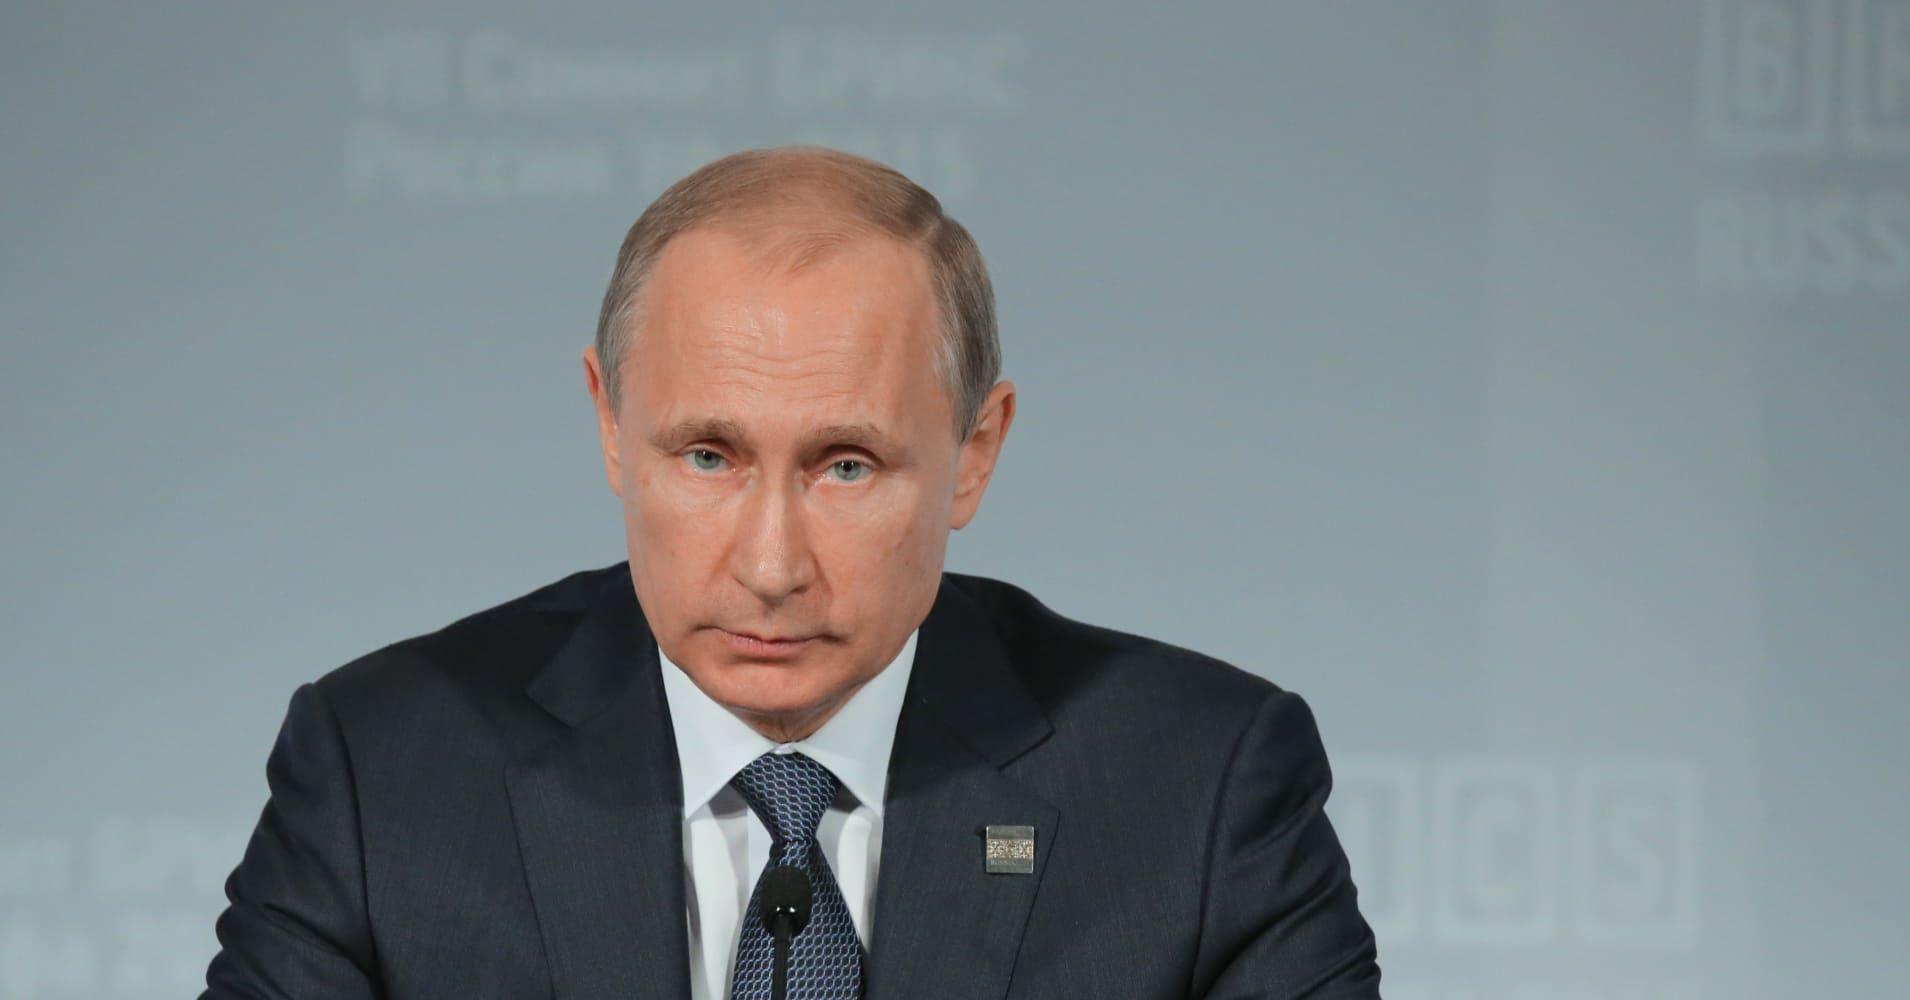 CNBC speaks to Russian President Vladimir Putin